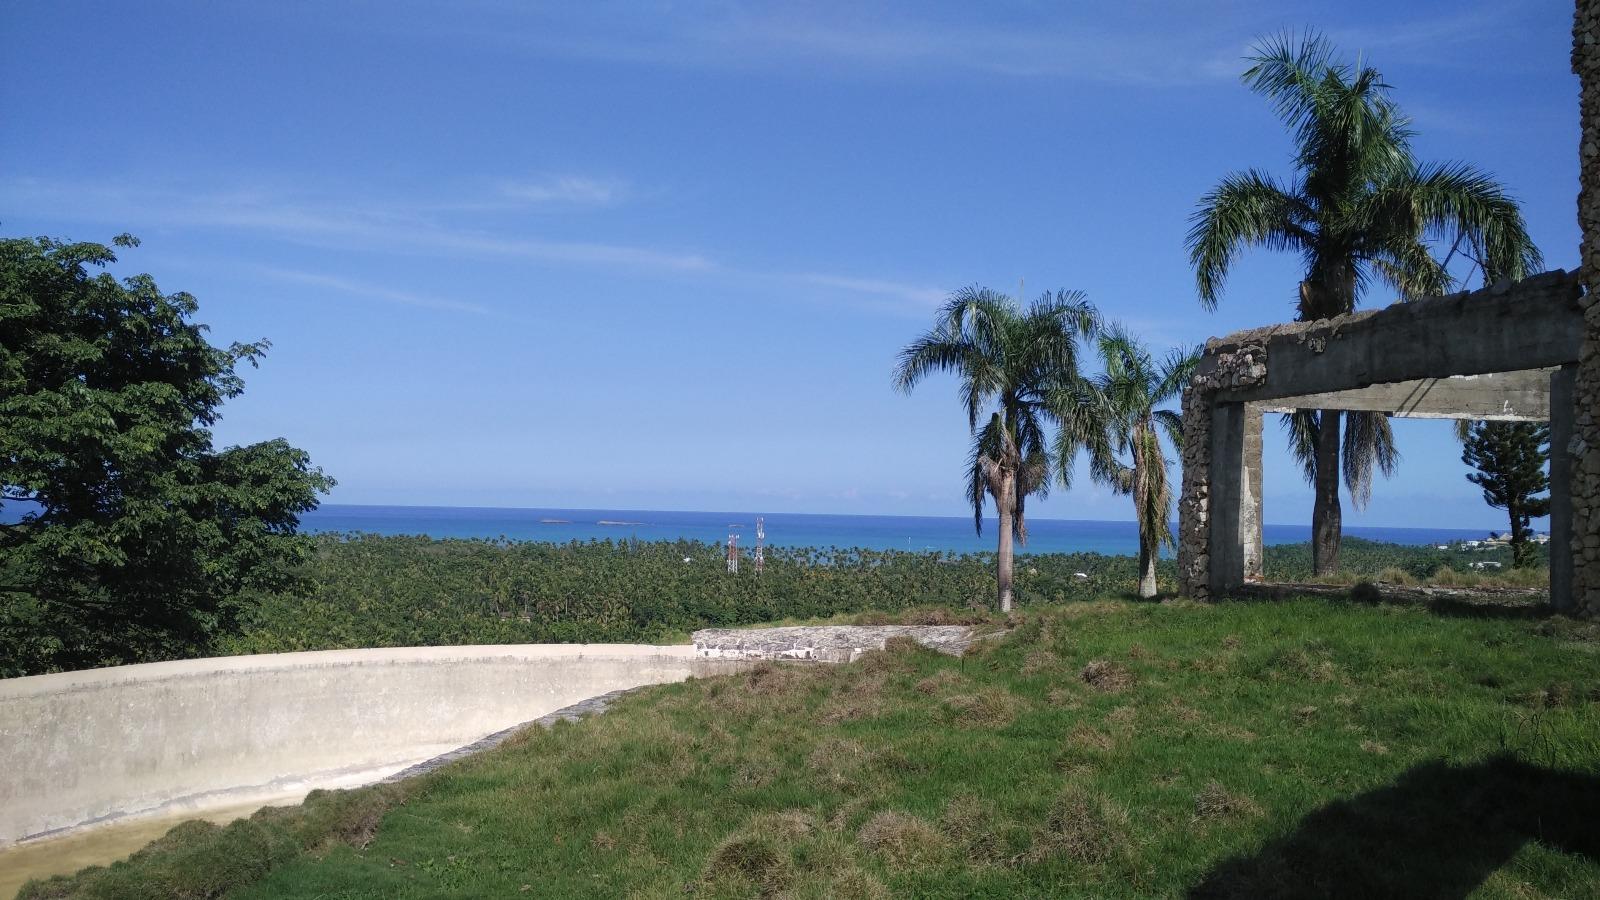 Hill for sale in Las Terrenas Dominican republic 7.jpeg